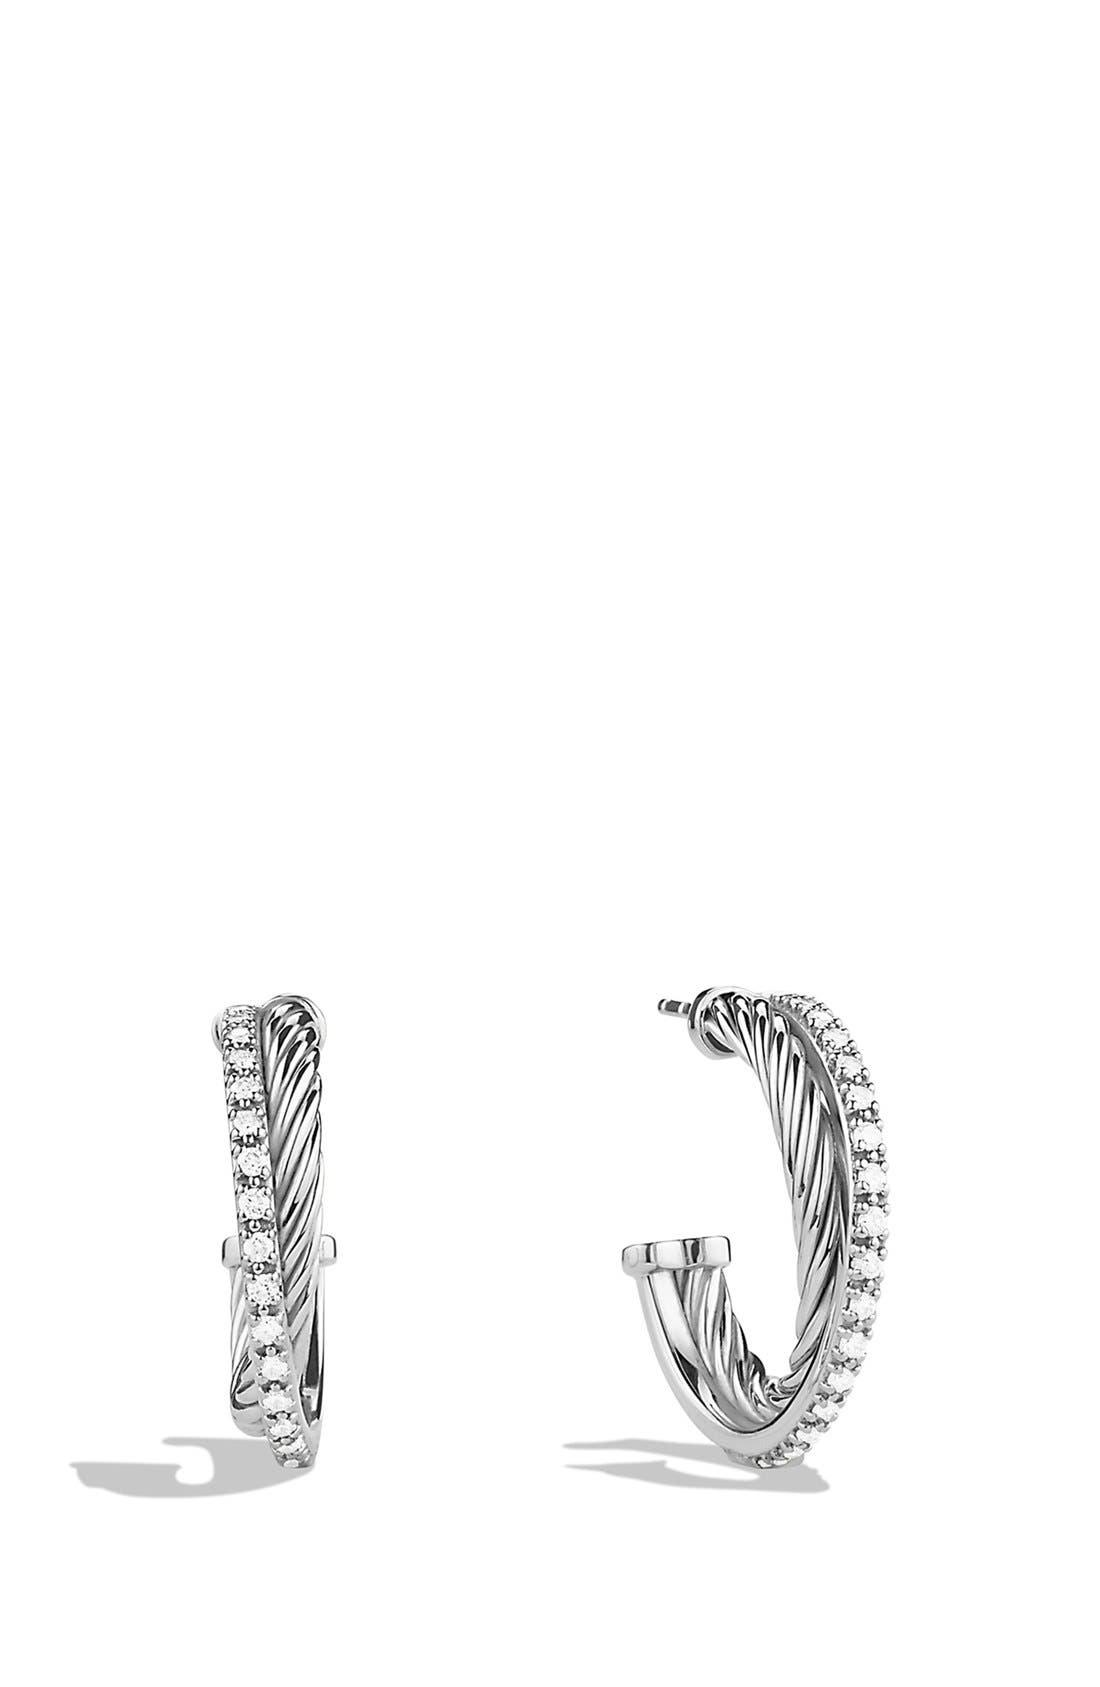 DAVID YURMAN Crossover Small Diamond Hoop Earrings